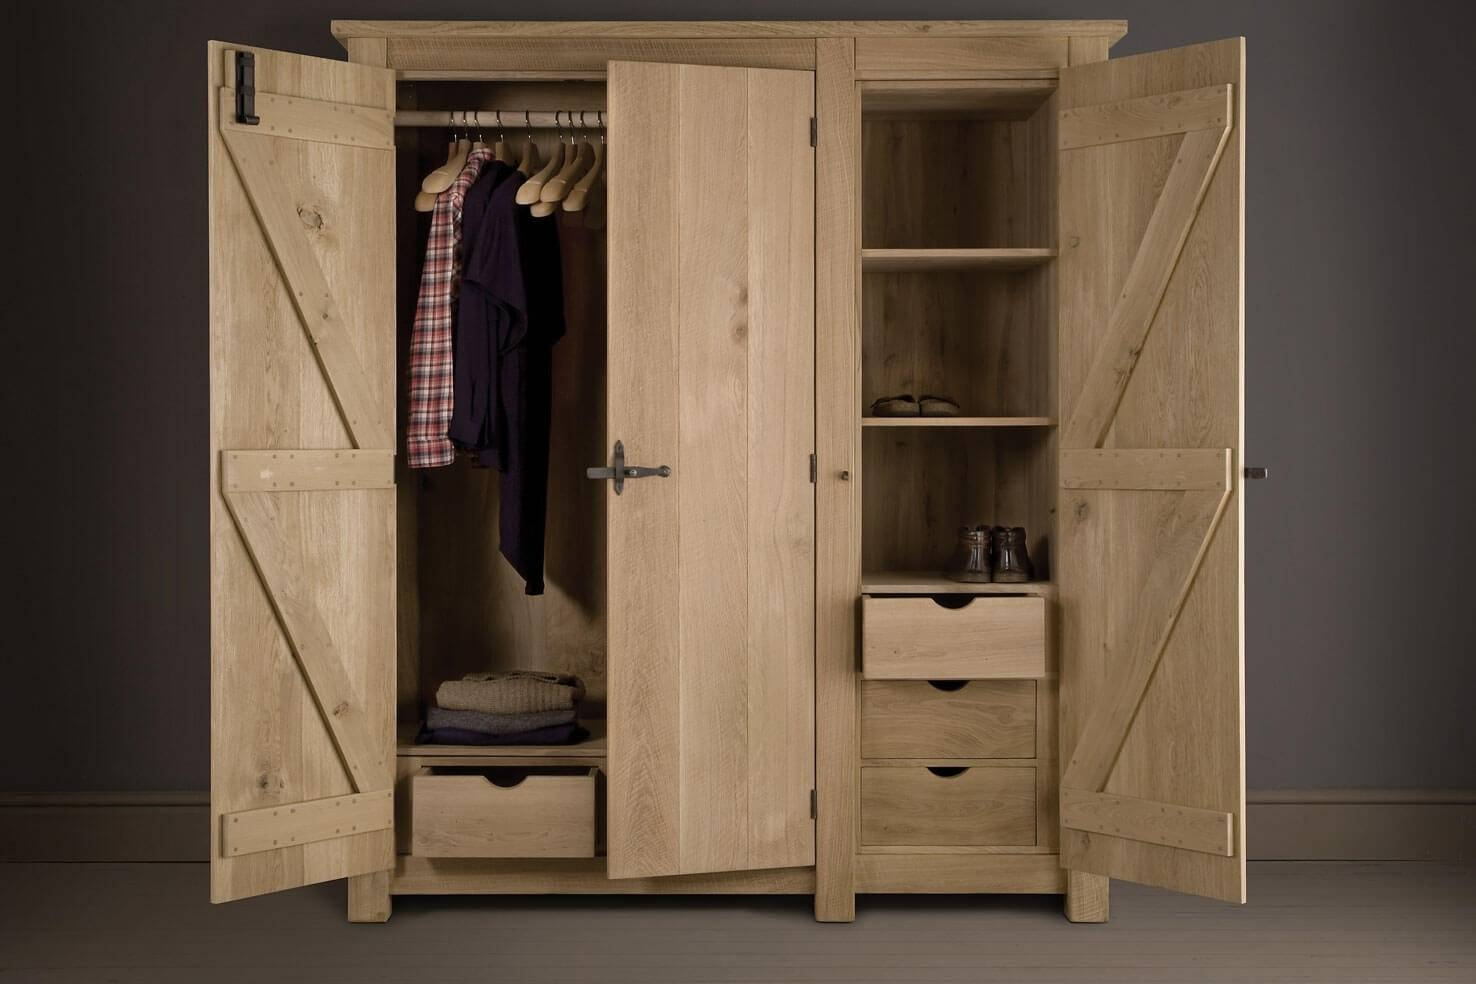 Oak Wardrobe, Handcraftedindigo Furniture Regarding Oak Wardrobe With Drawers And Shelves (View 20 of 30)